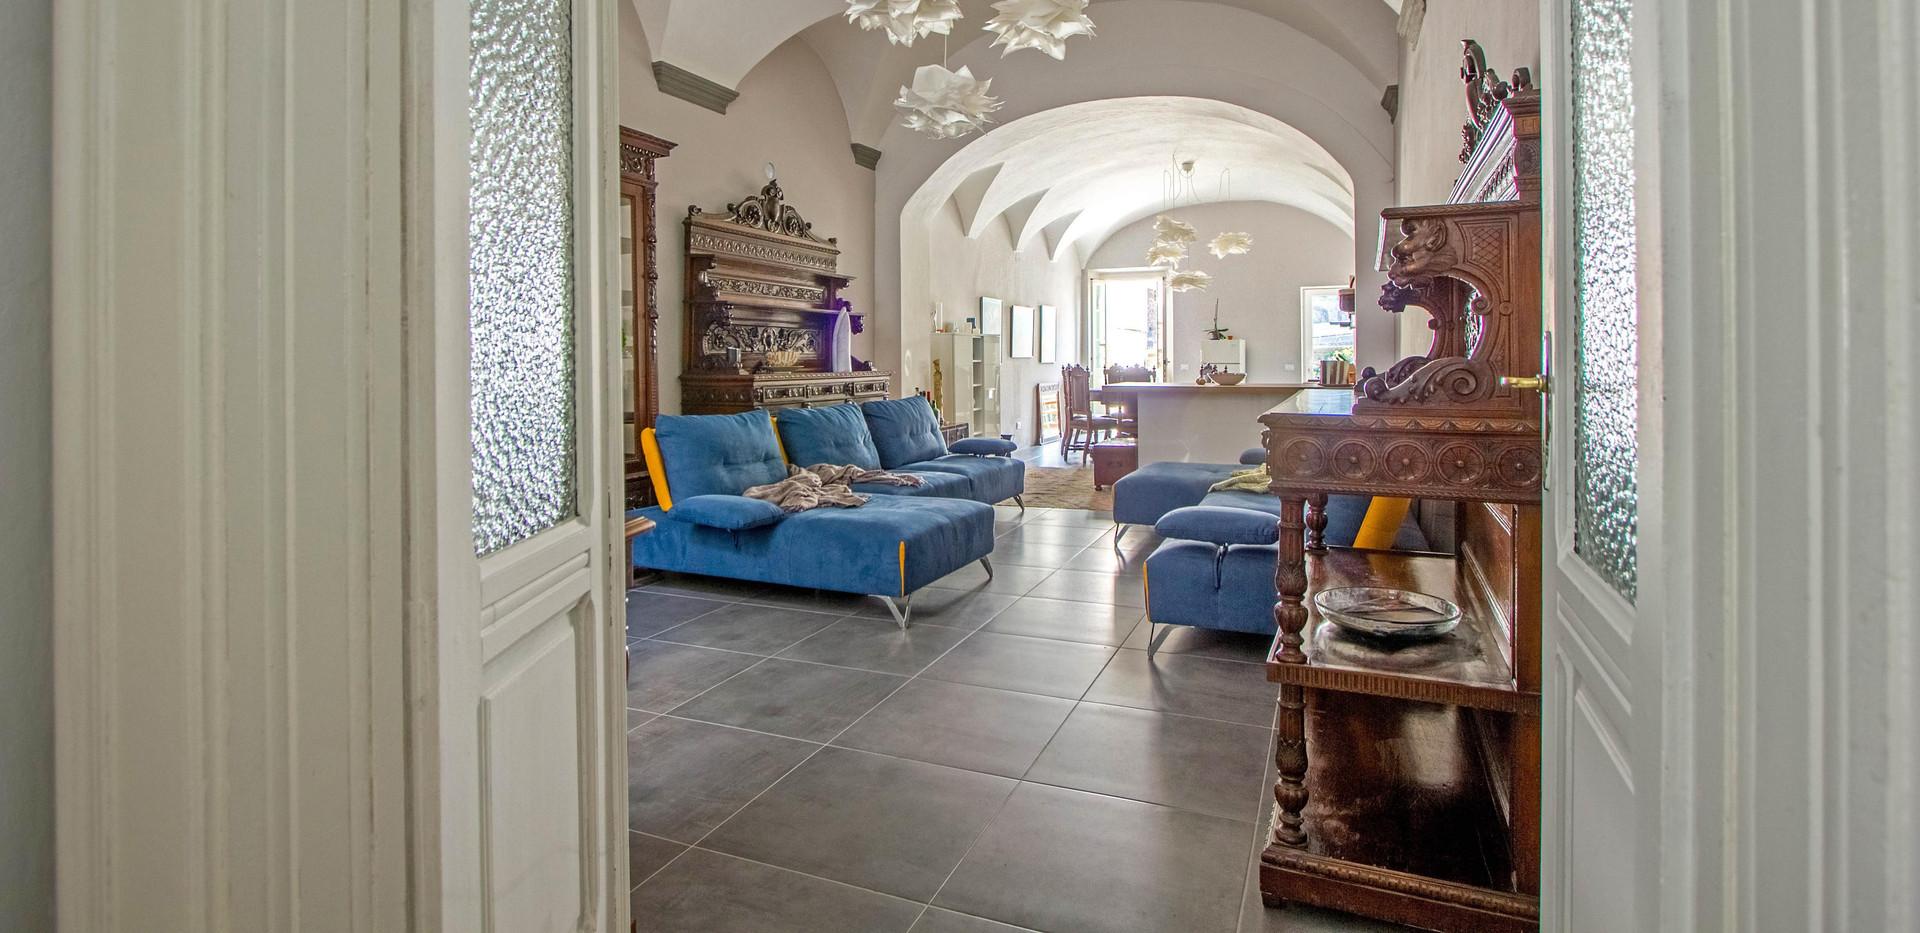 Lo scultore - Pontremoli - Living Room2.